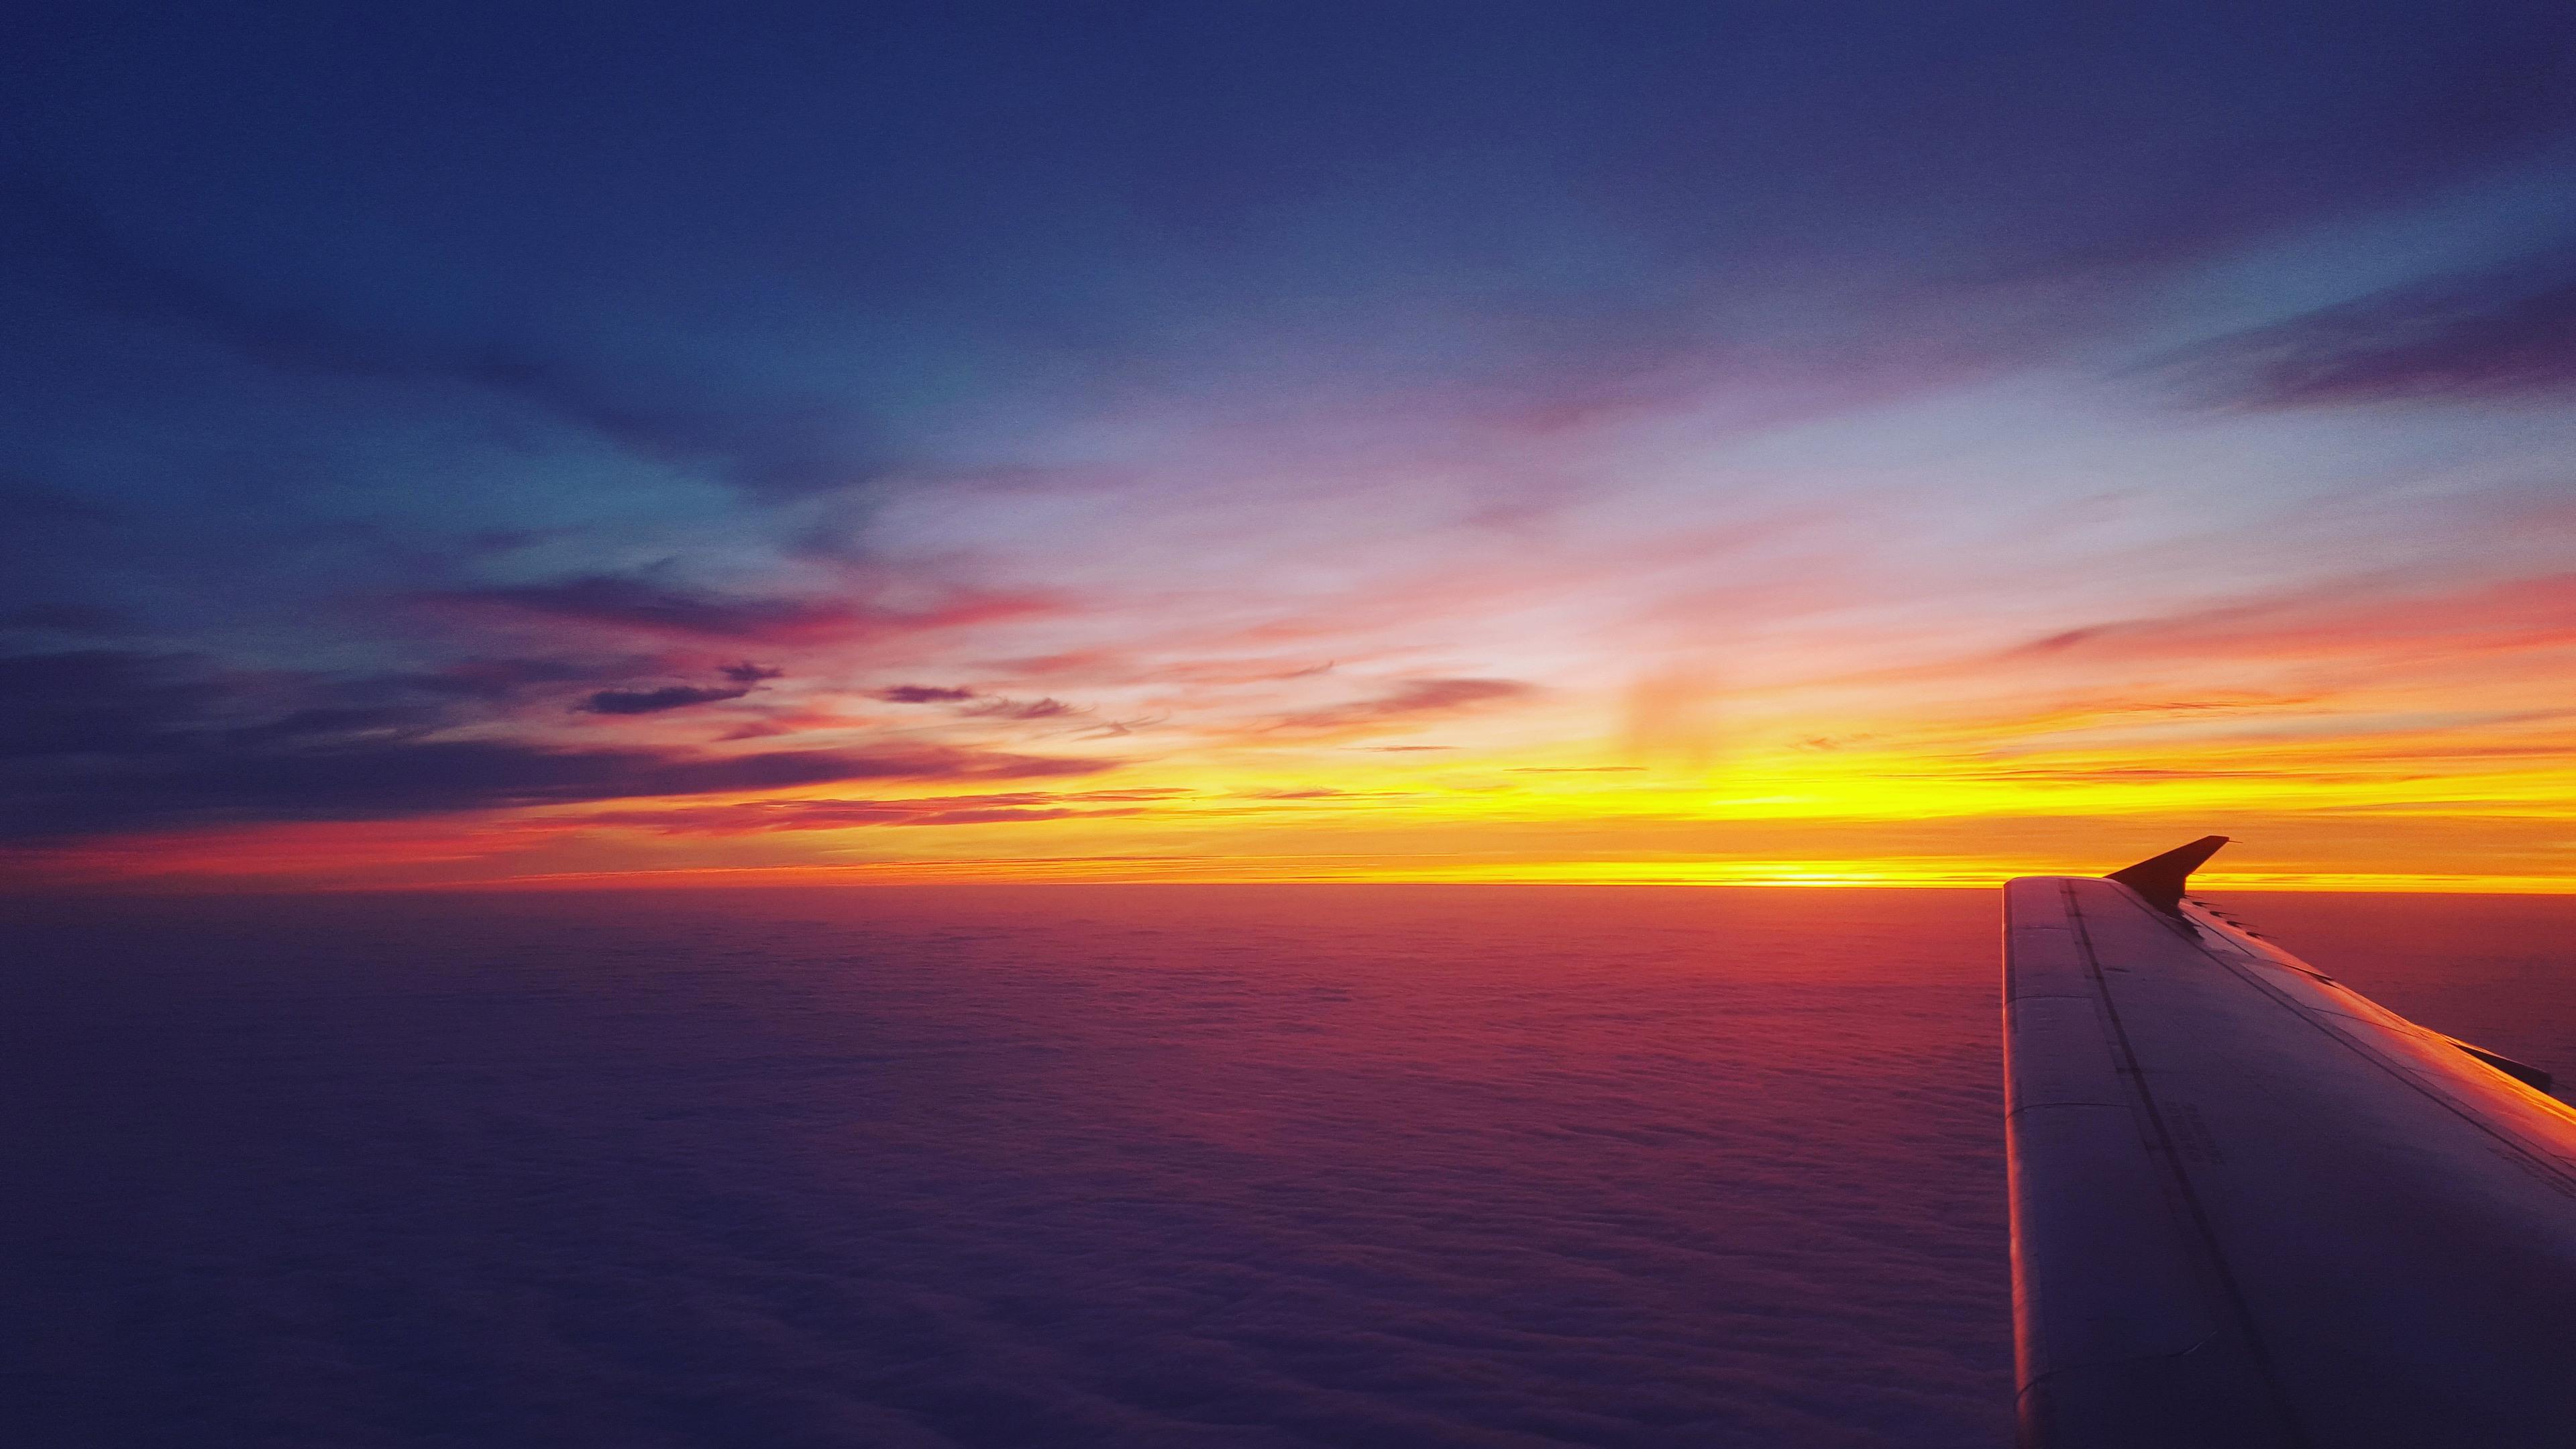 airplane dawn dusk flight sunrise sky 4k 1547938026 - Airplane Dawn Dusk Flight Sunrise Sky 4k - sunrise wallpapers, sky wallpapers, hd-wallpapers, flight wallpapers, dusk wallpapers, airplane wallpapers, 5k wallpapers, 4k-wallpapers